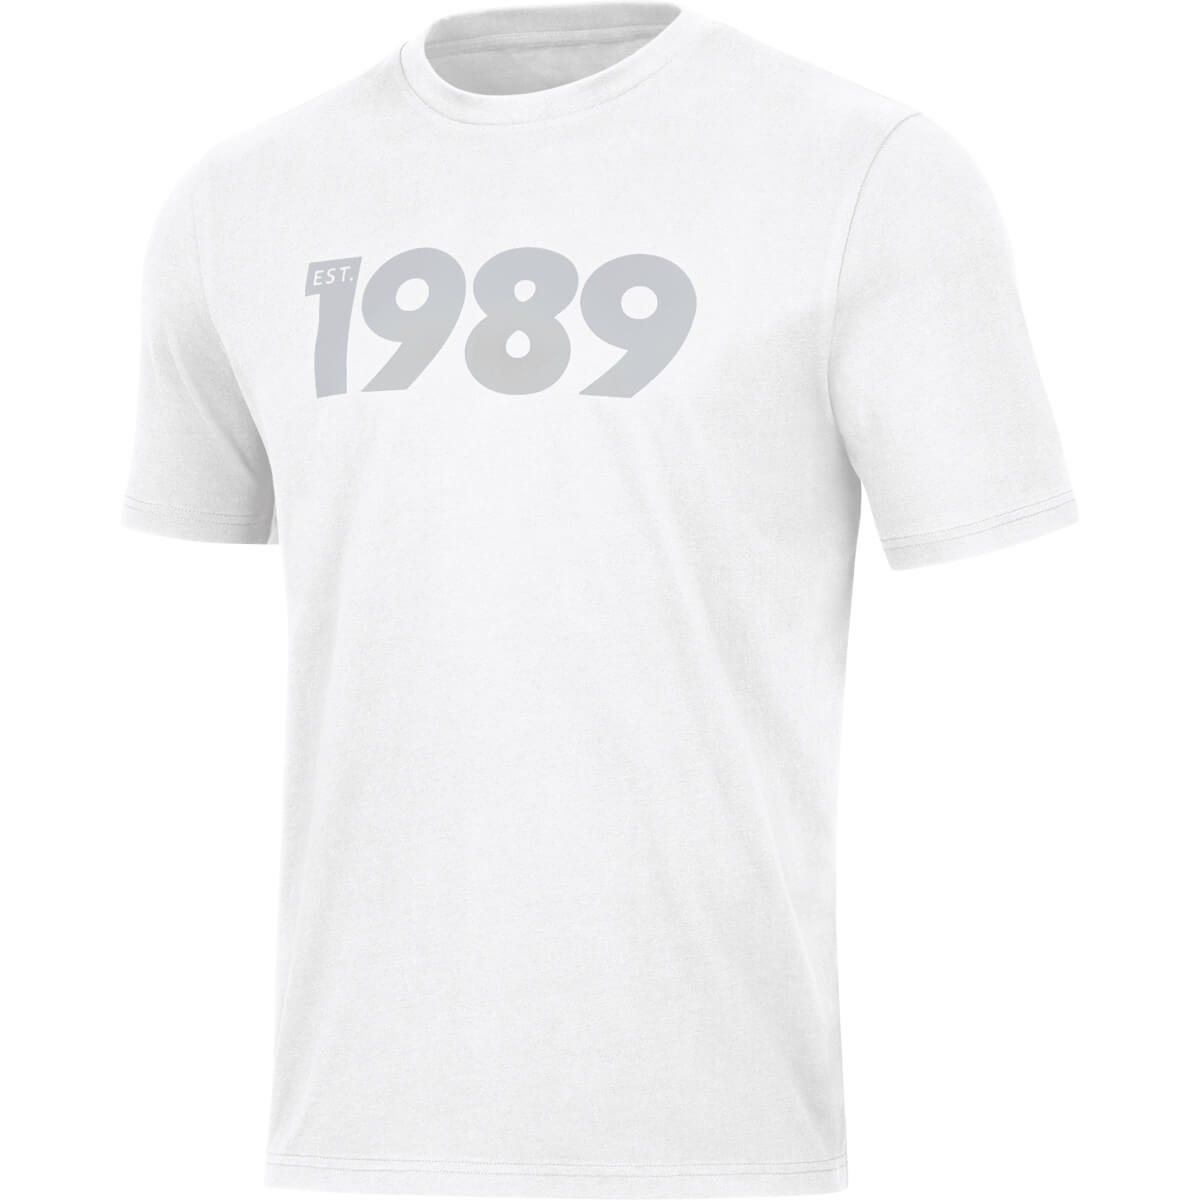 T-Shirt 1989 - Herren | Jako 6189